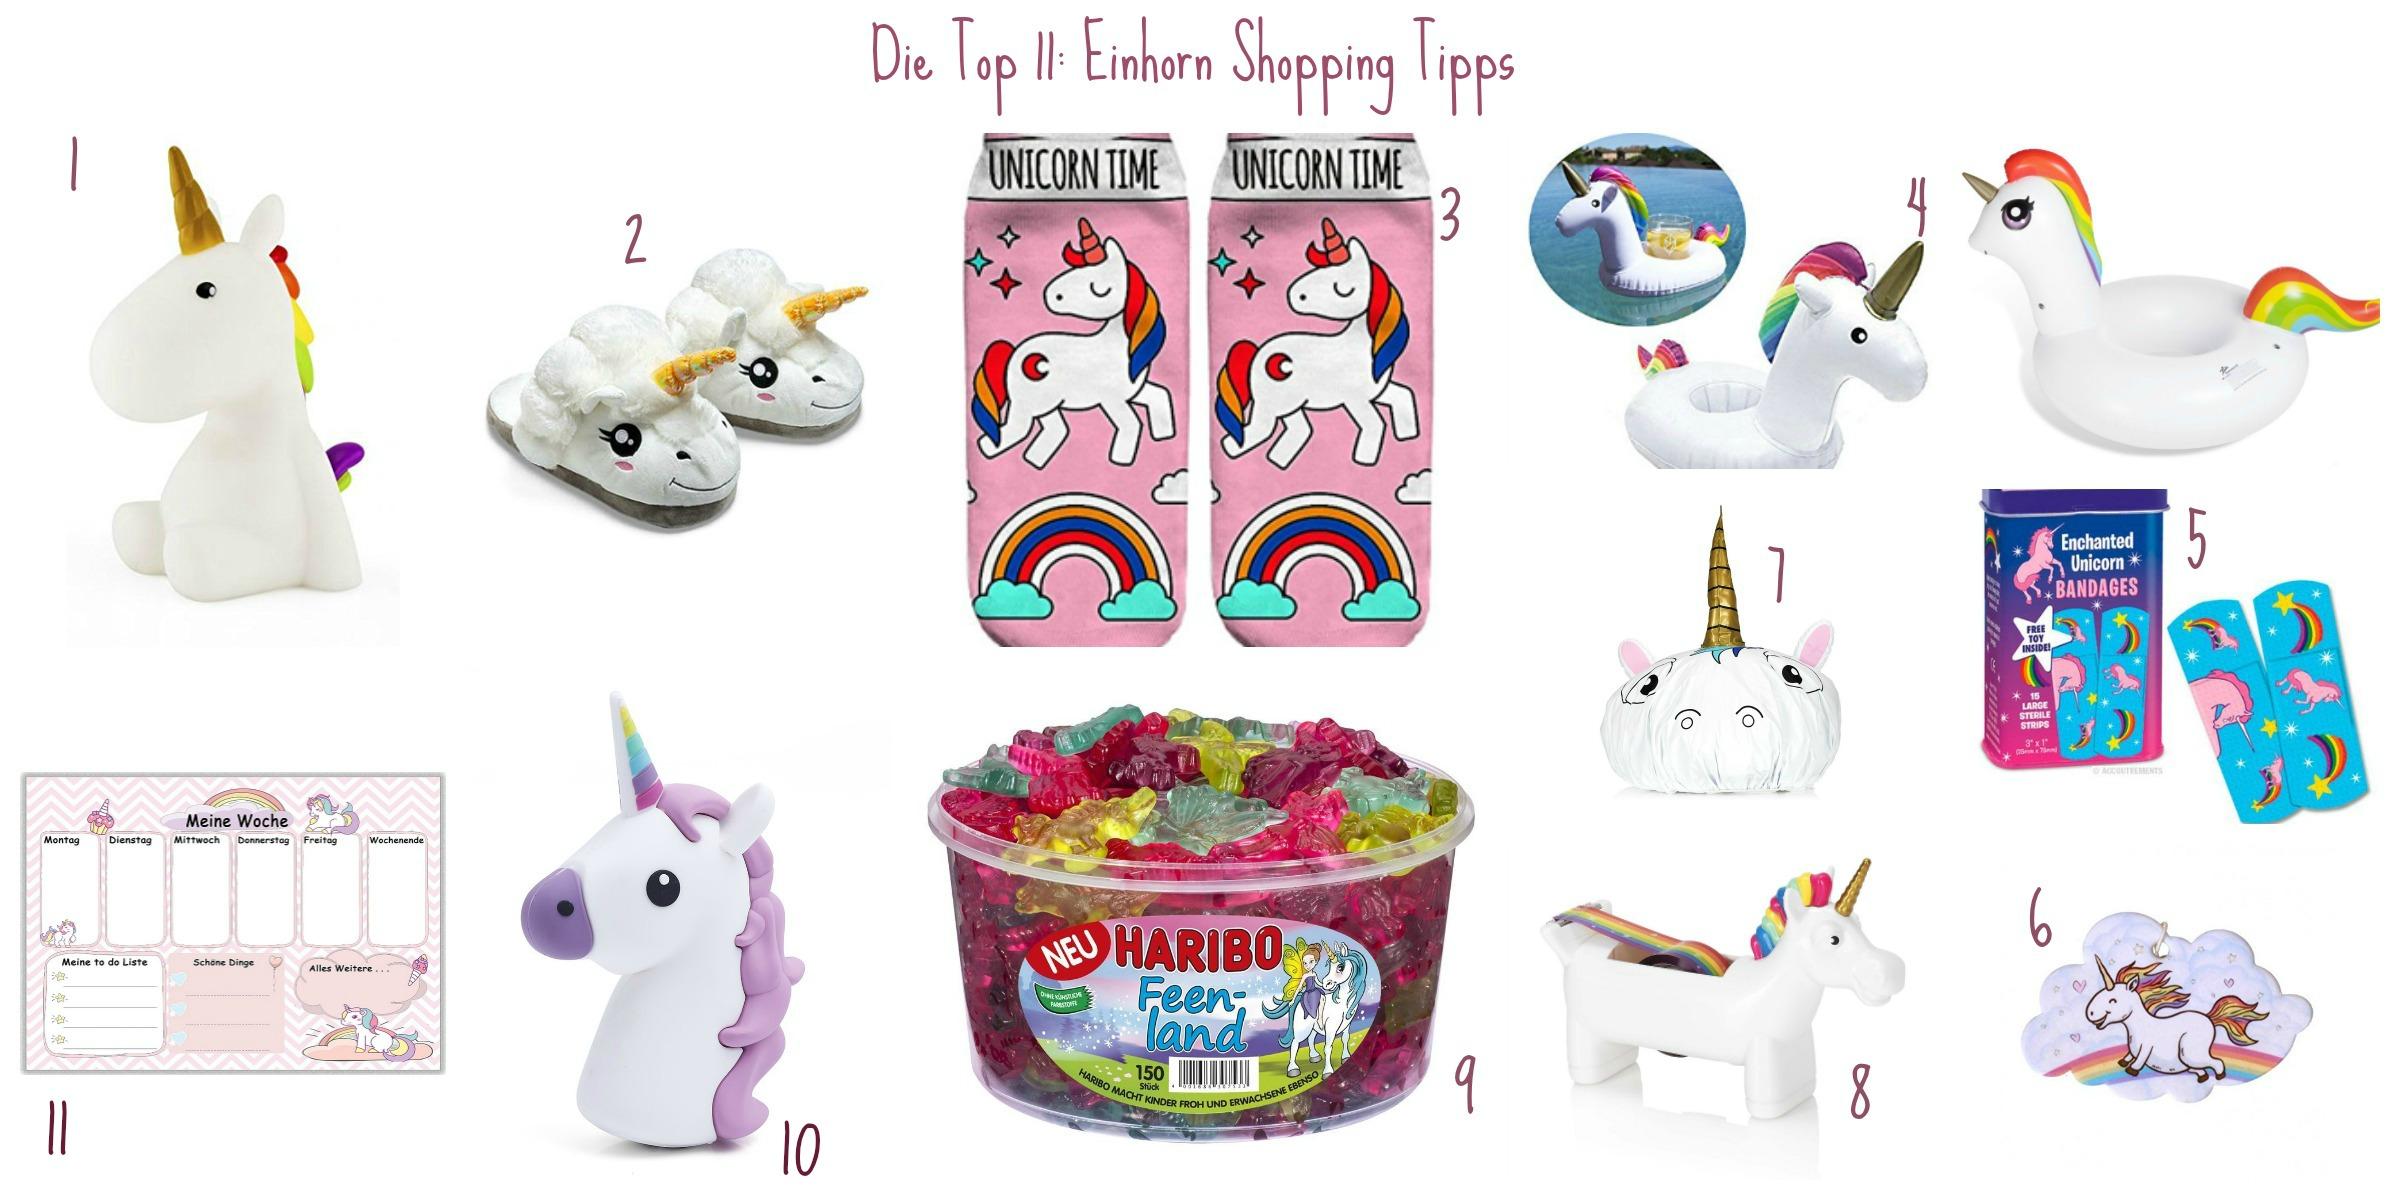 Einhorn Shopping Tipps